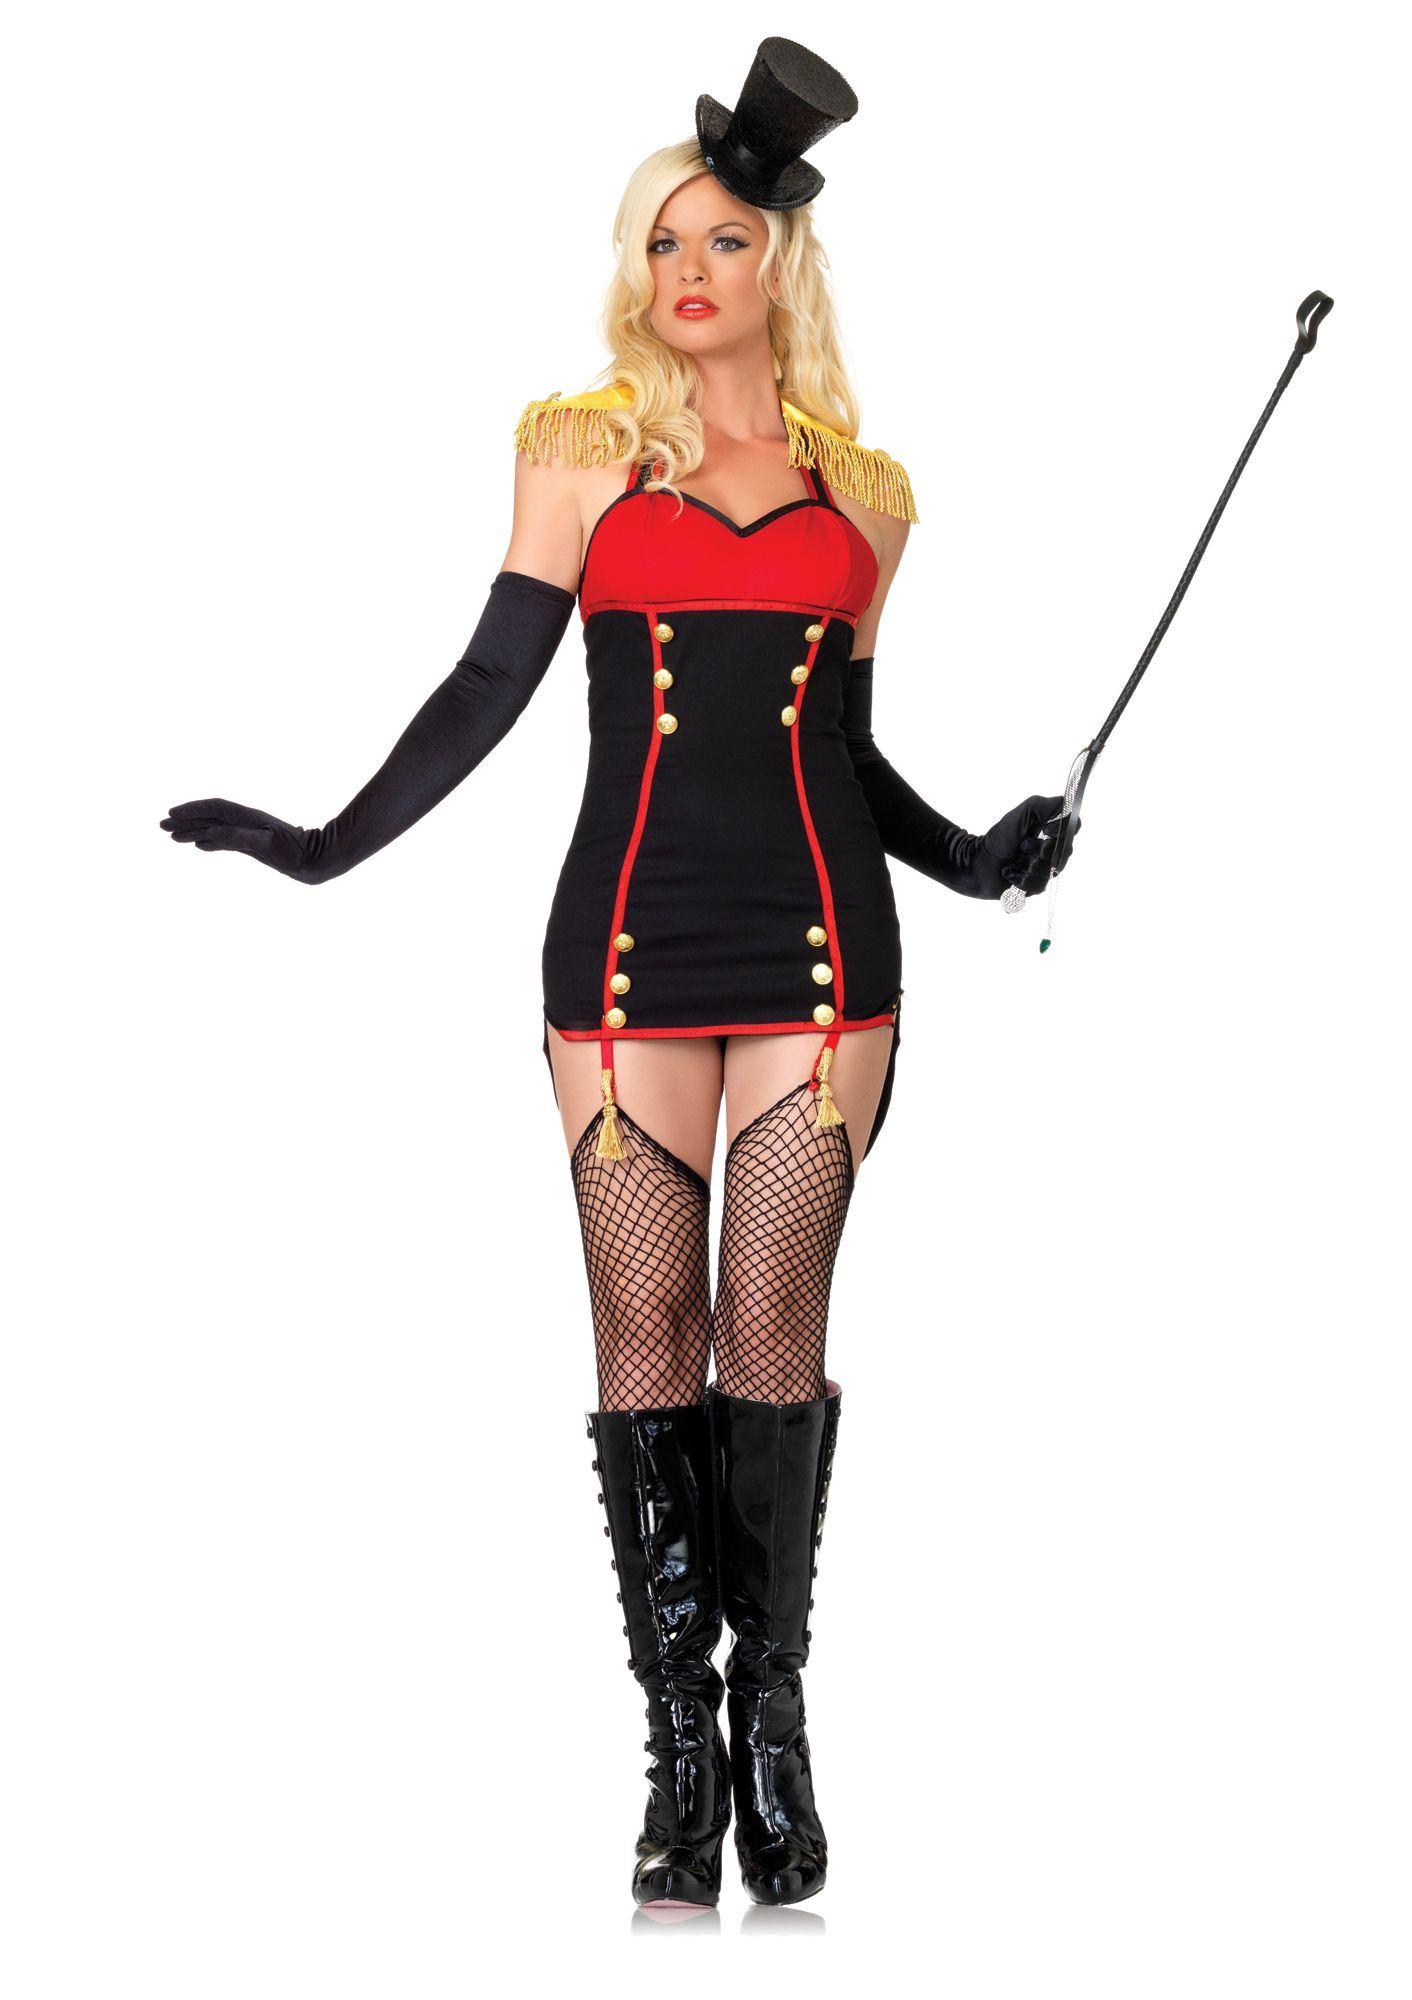 Ring master women halloween costume 44 99 the costume land